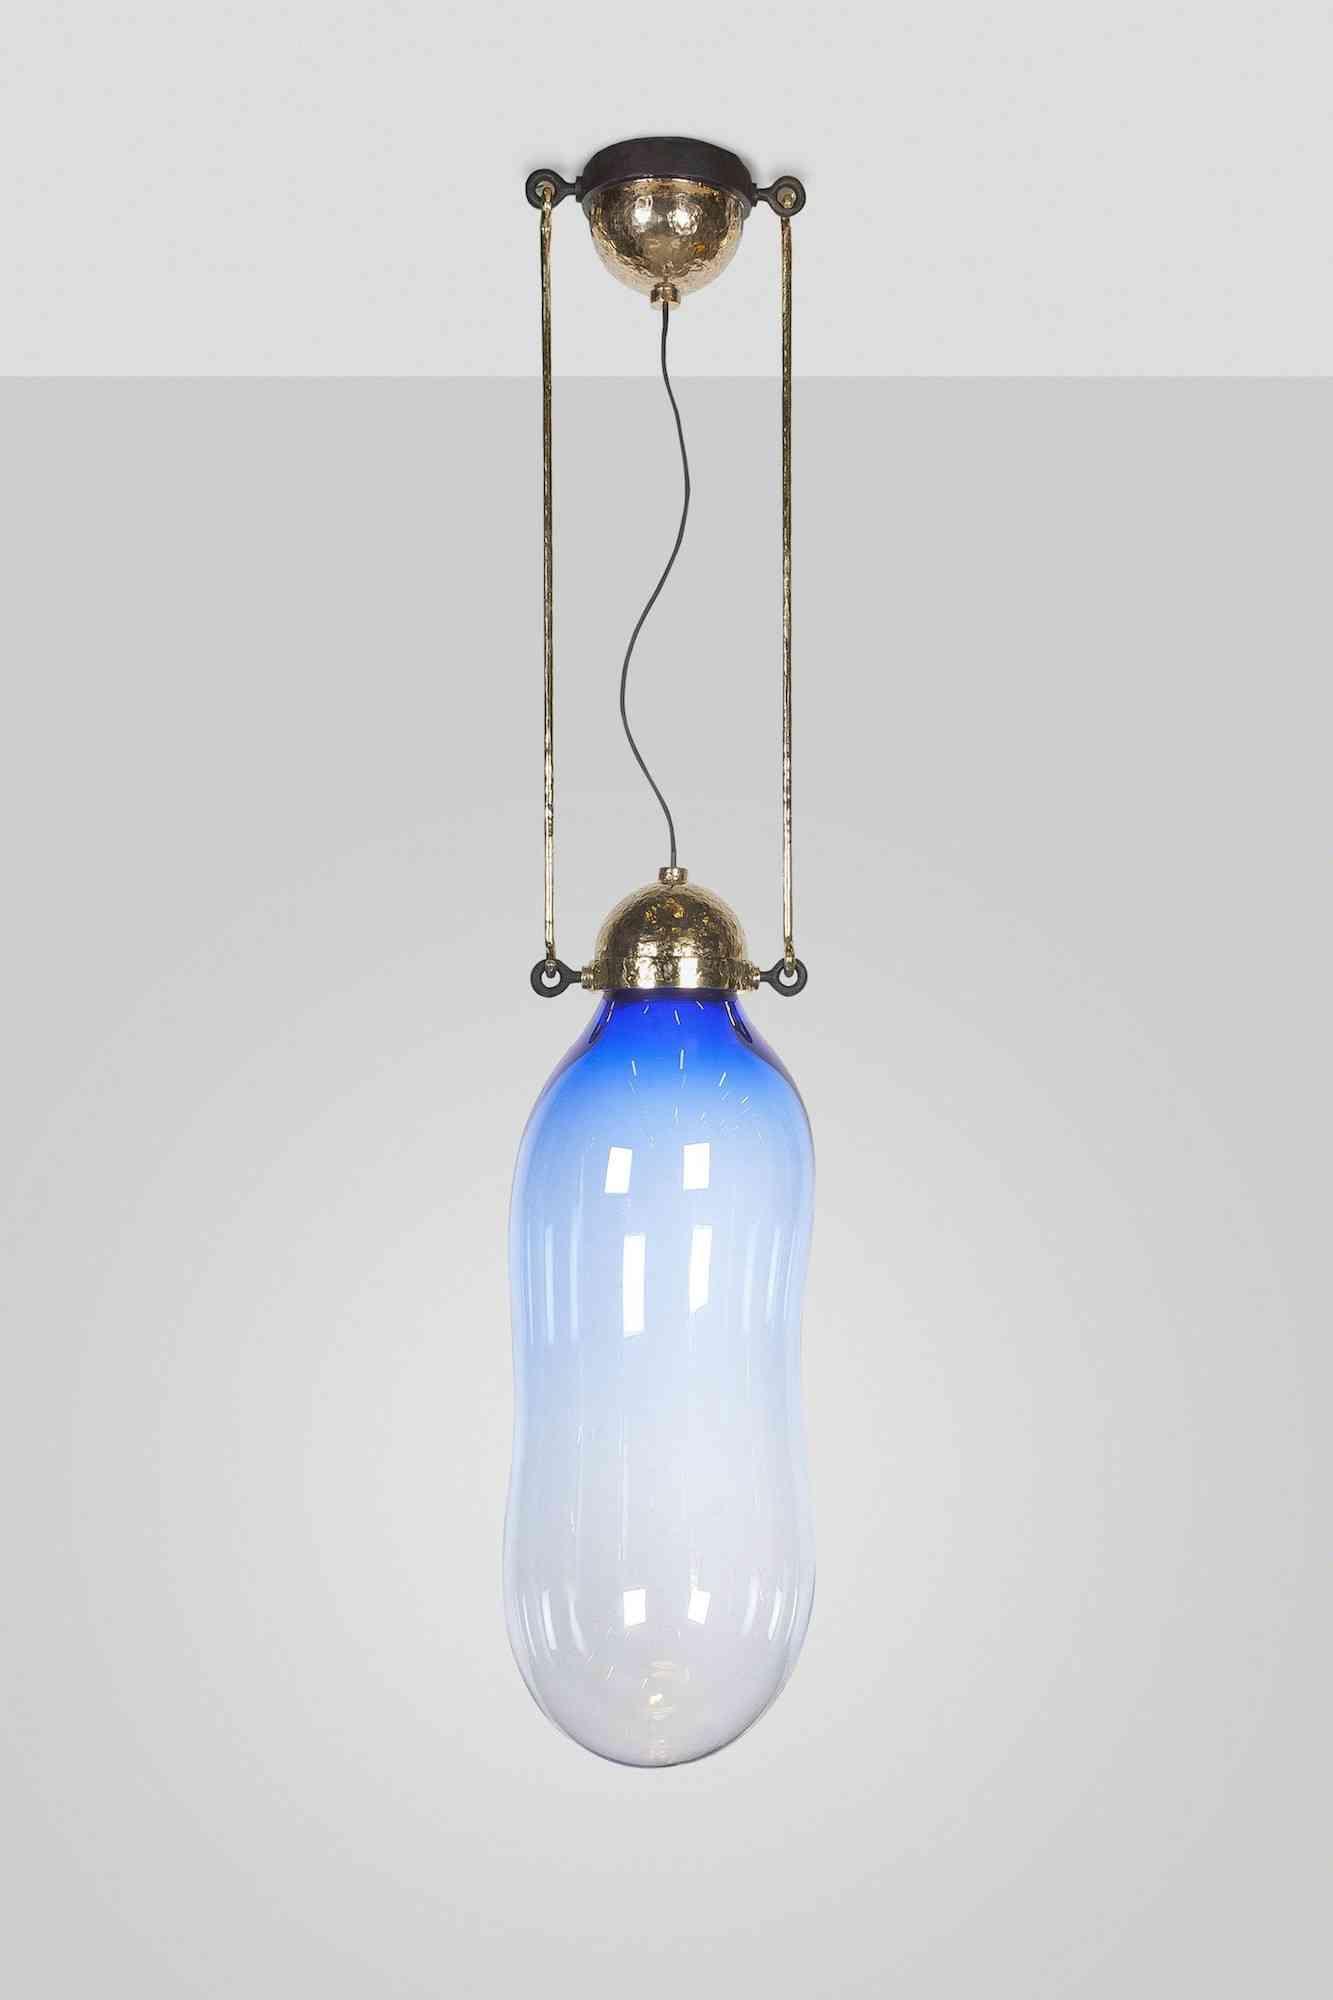 Lámparas inspiradas en pompas de jabón azul